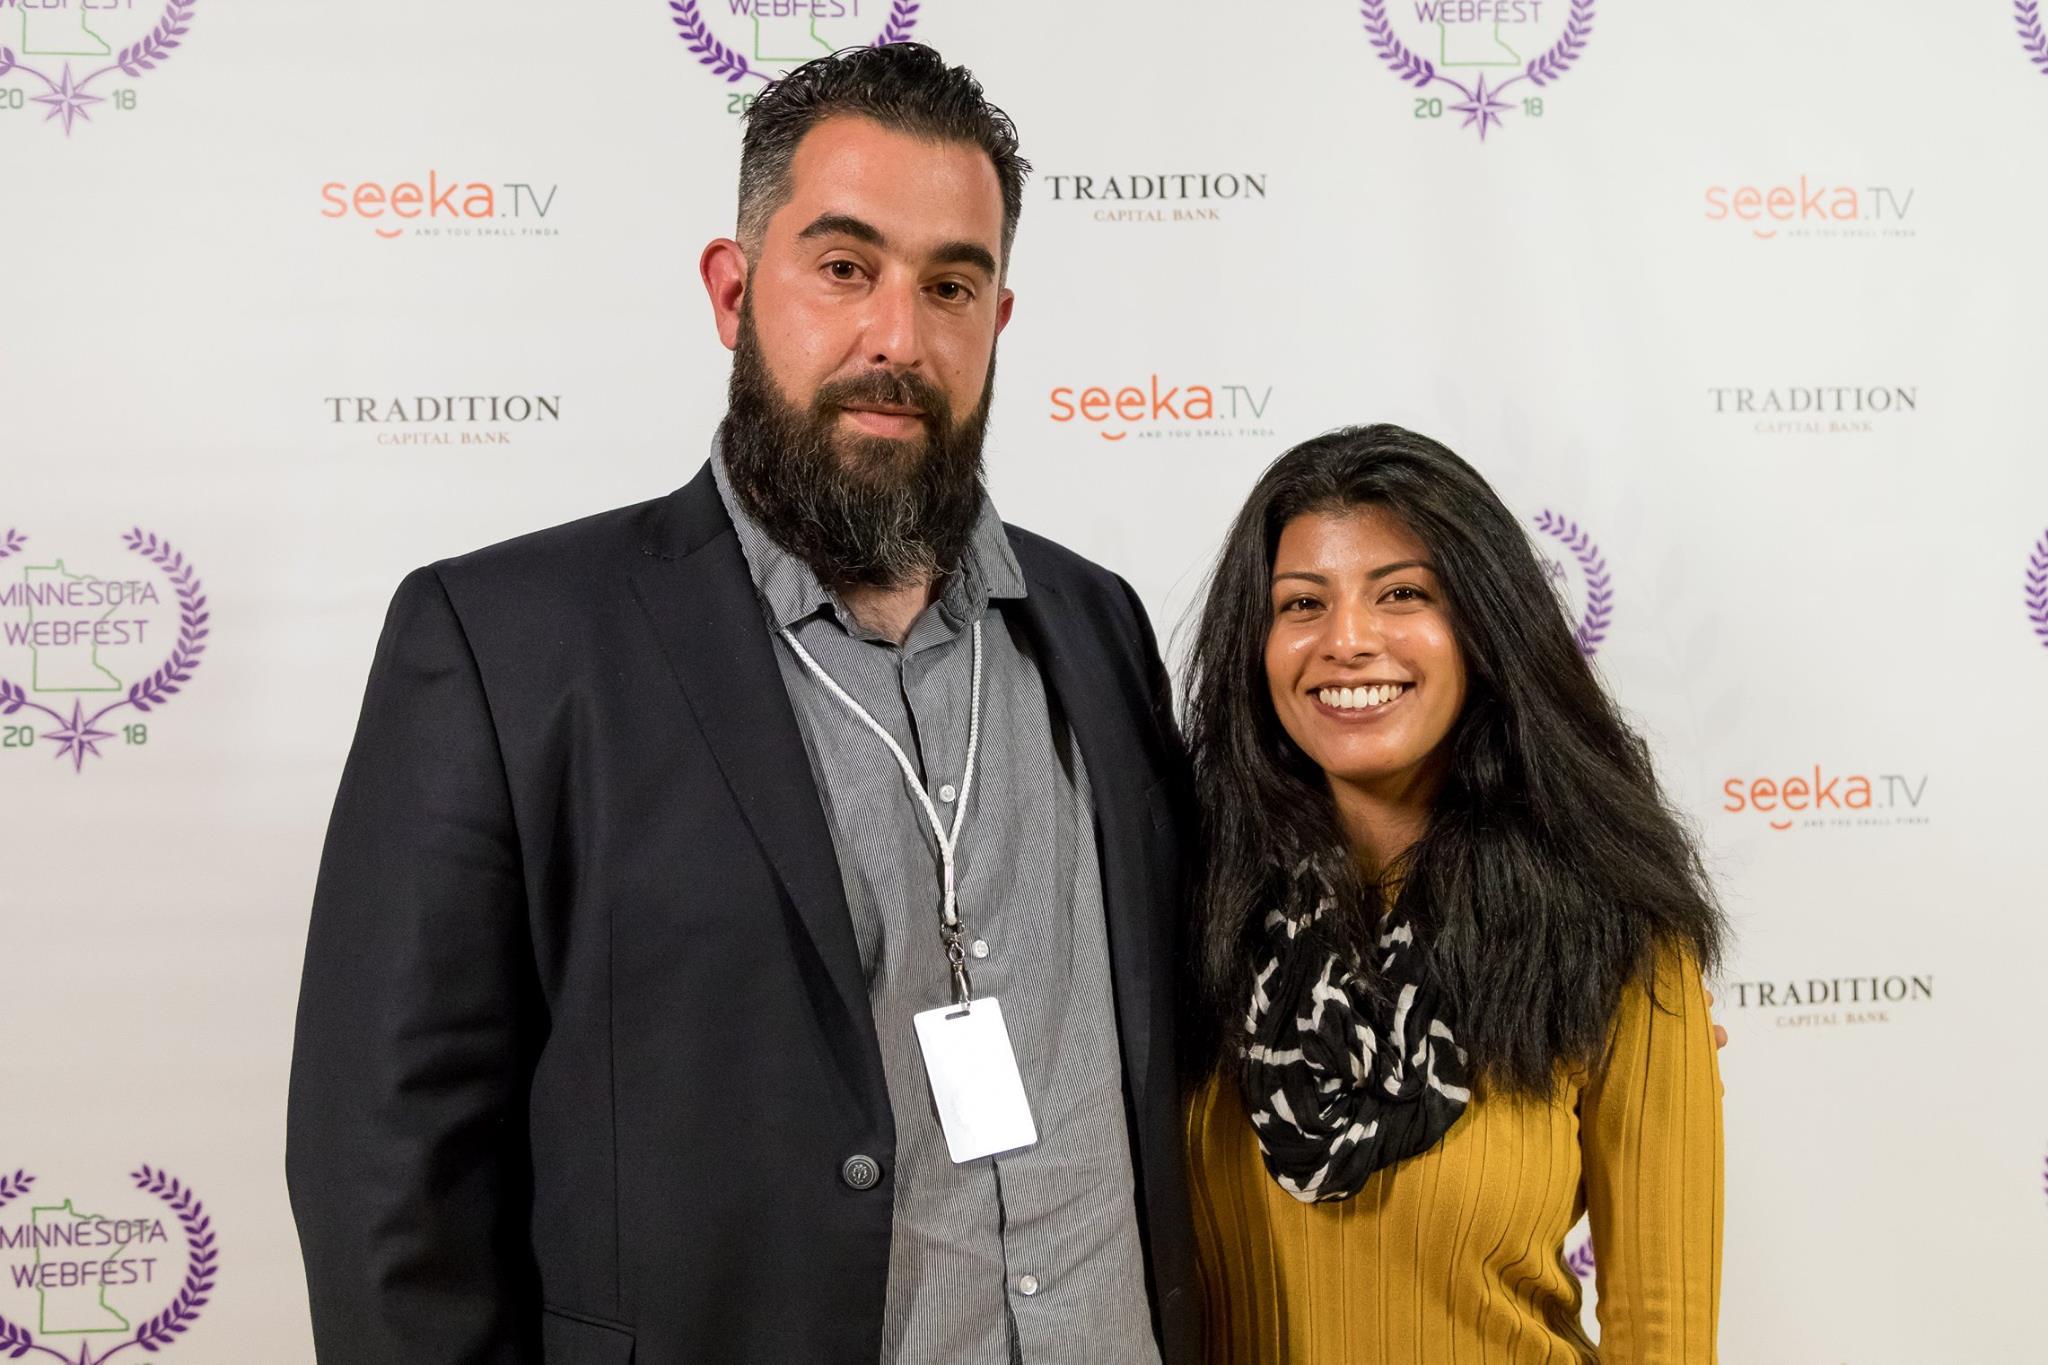 MN Web Fest Awards